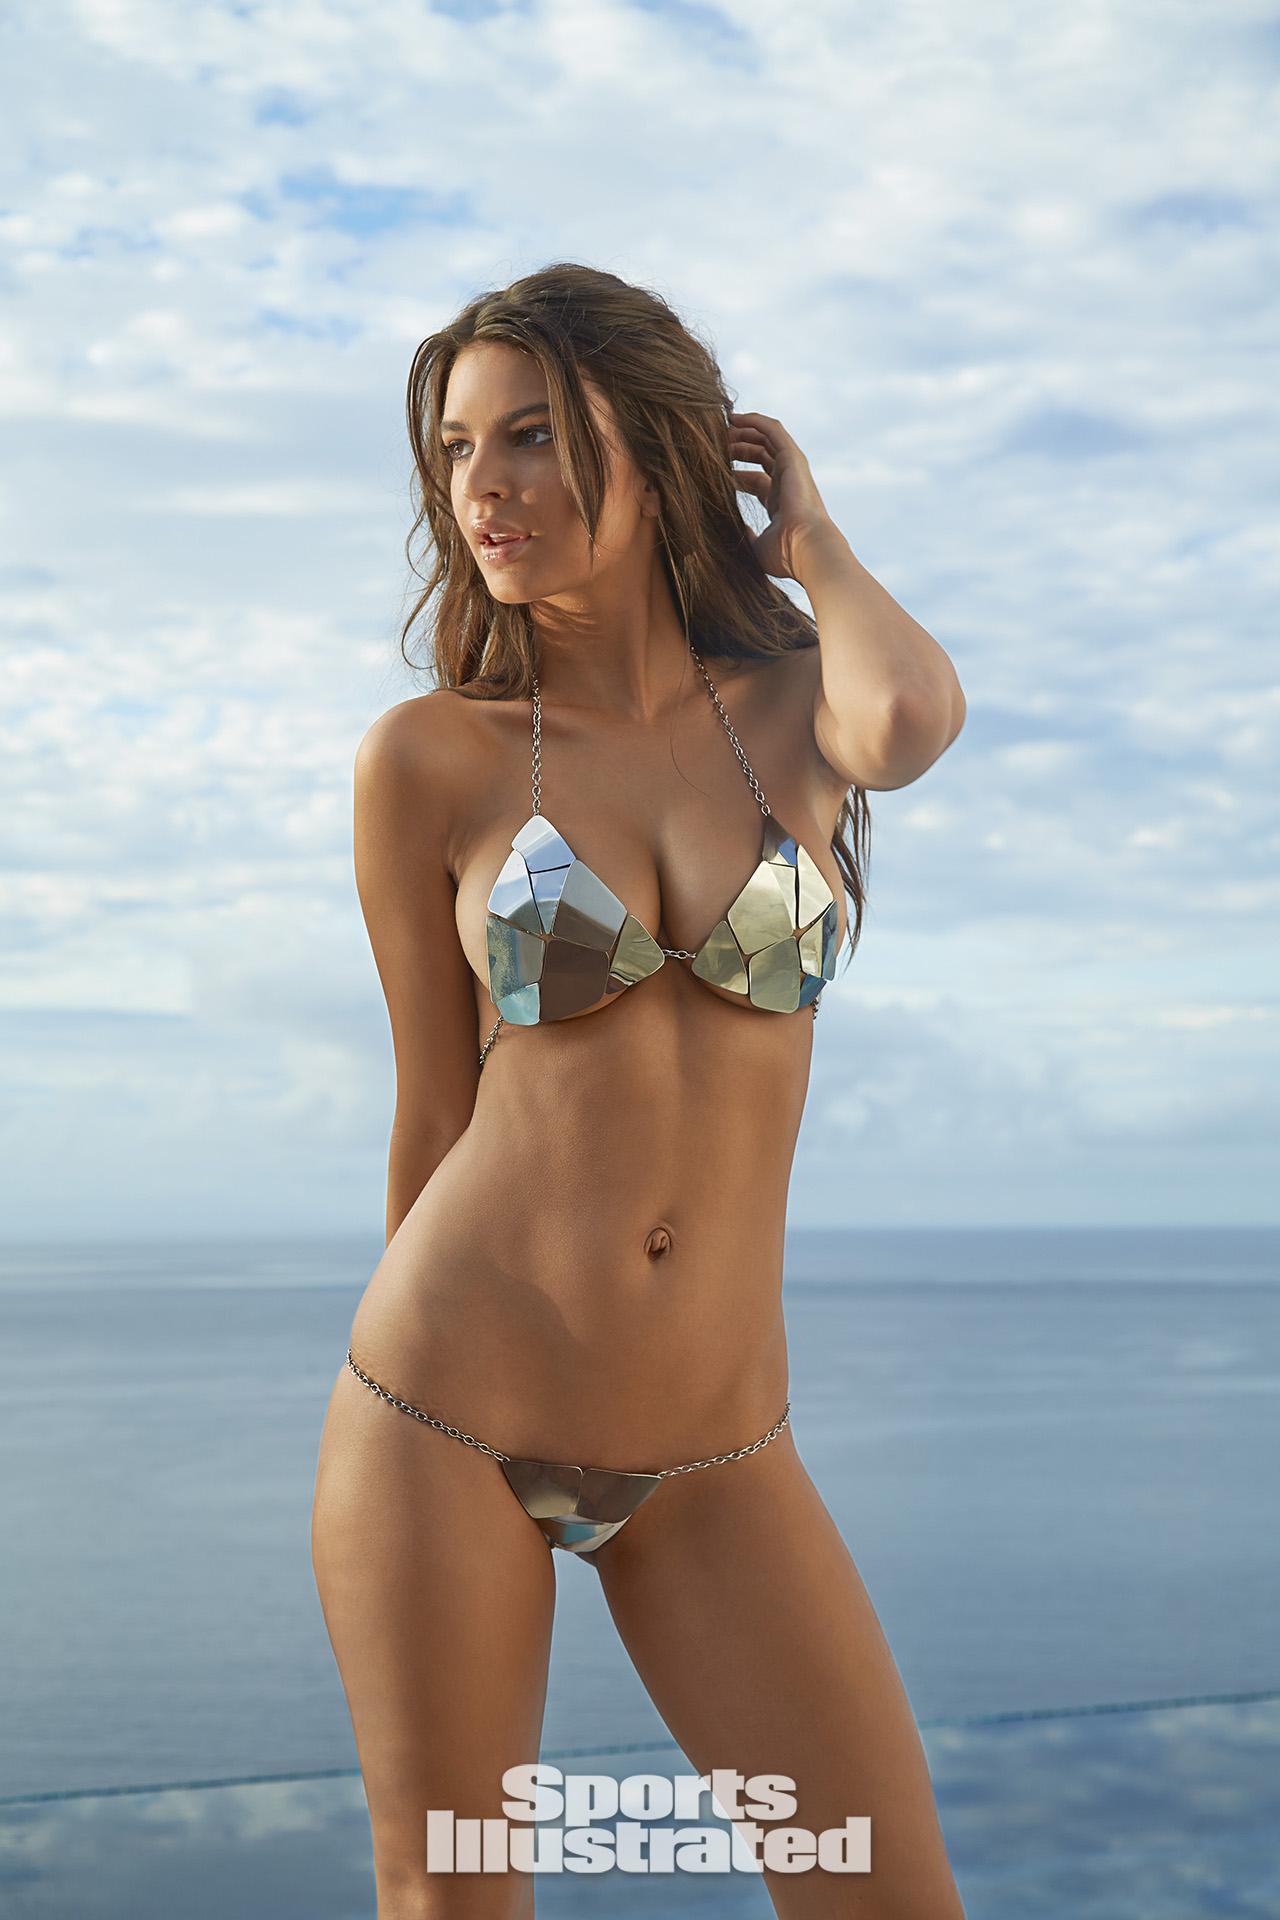 910776a1a6b Emily Ratajkowski's daily skin routine costs $800 | SI.com